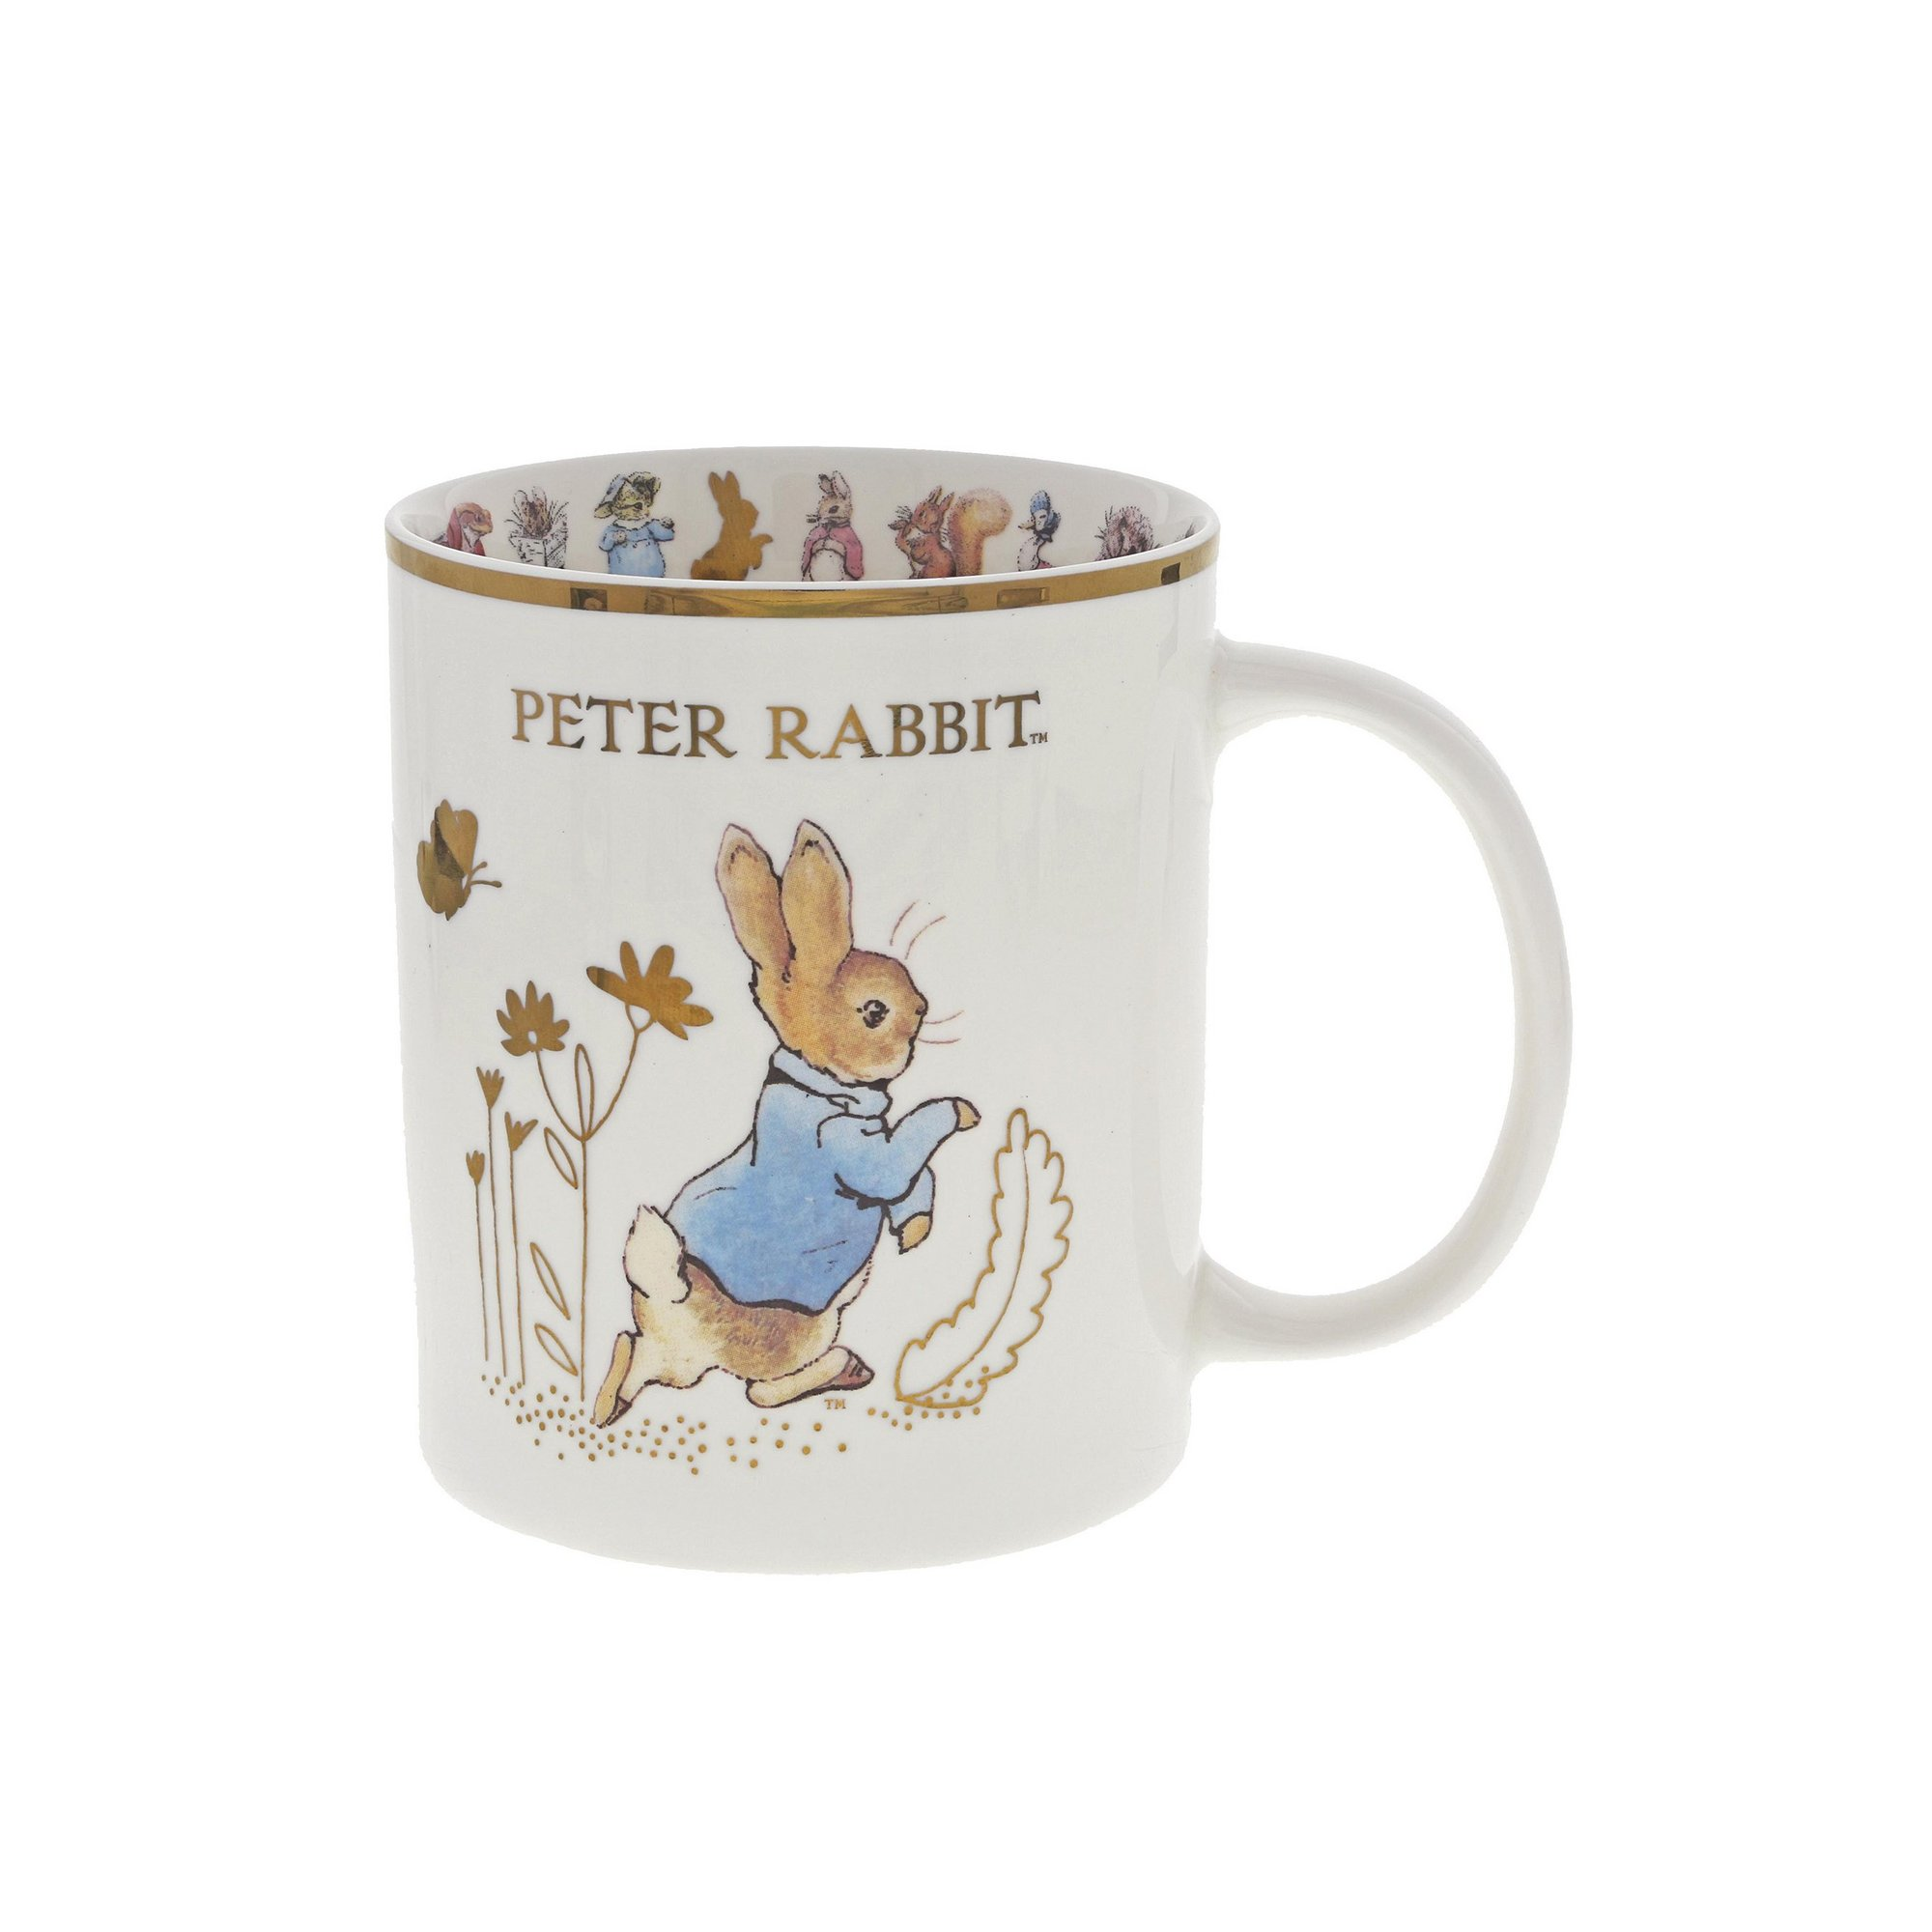 Image of Beatrix Potter Peter Rabbit 2019 Edition Mug